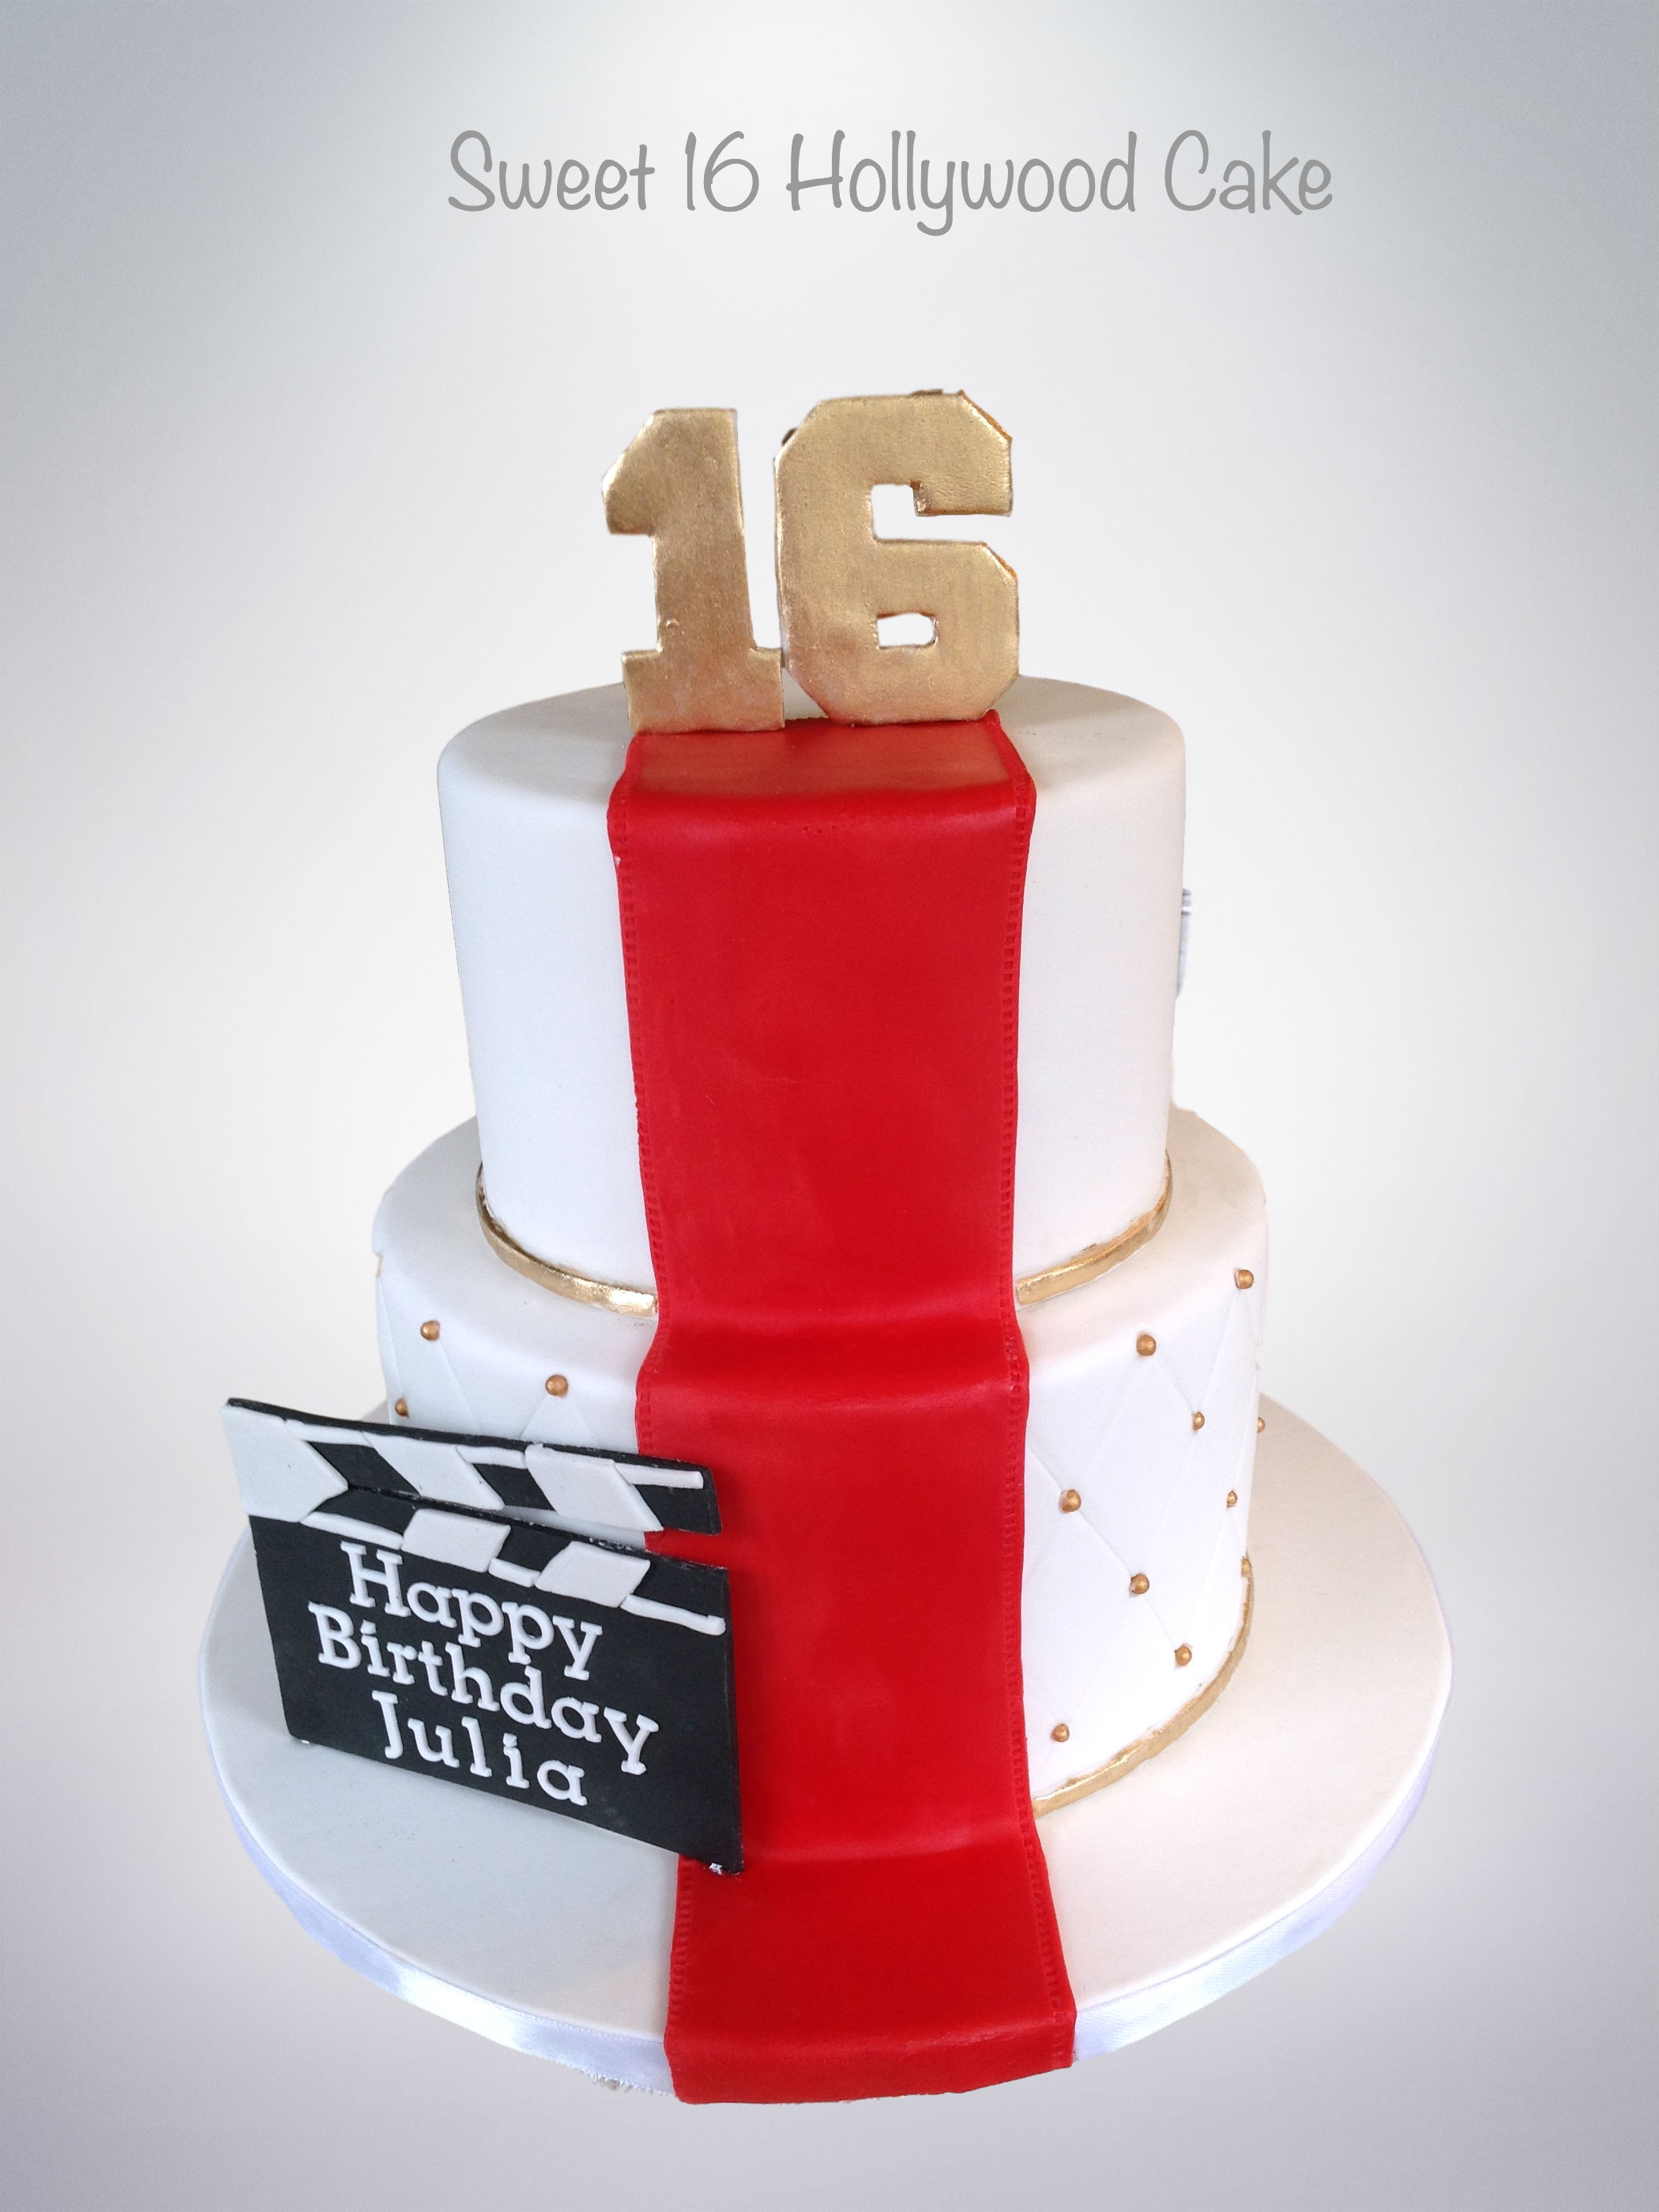 Brilliant Sweet 16 Hollywood Cake Cake Celebrations Monroe Ny Funny Birthday Cards Online Elaedamsfinfo